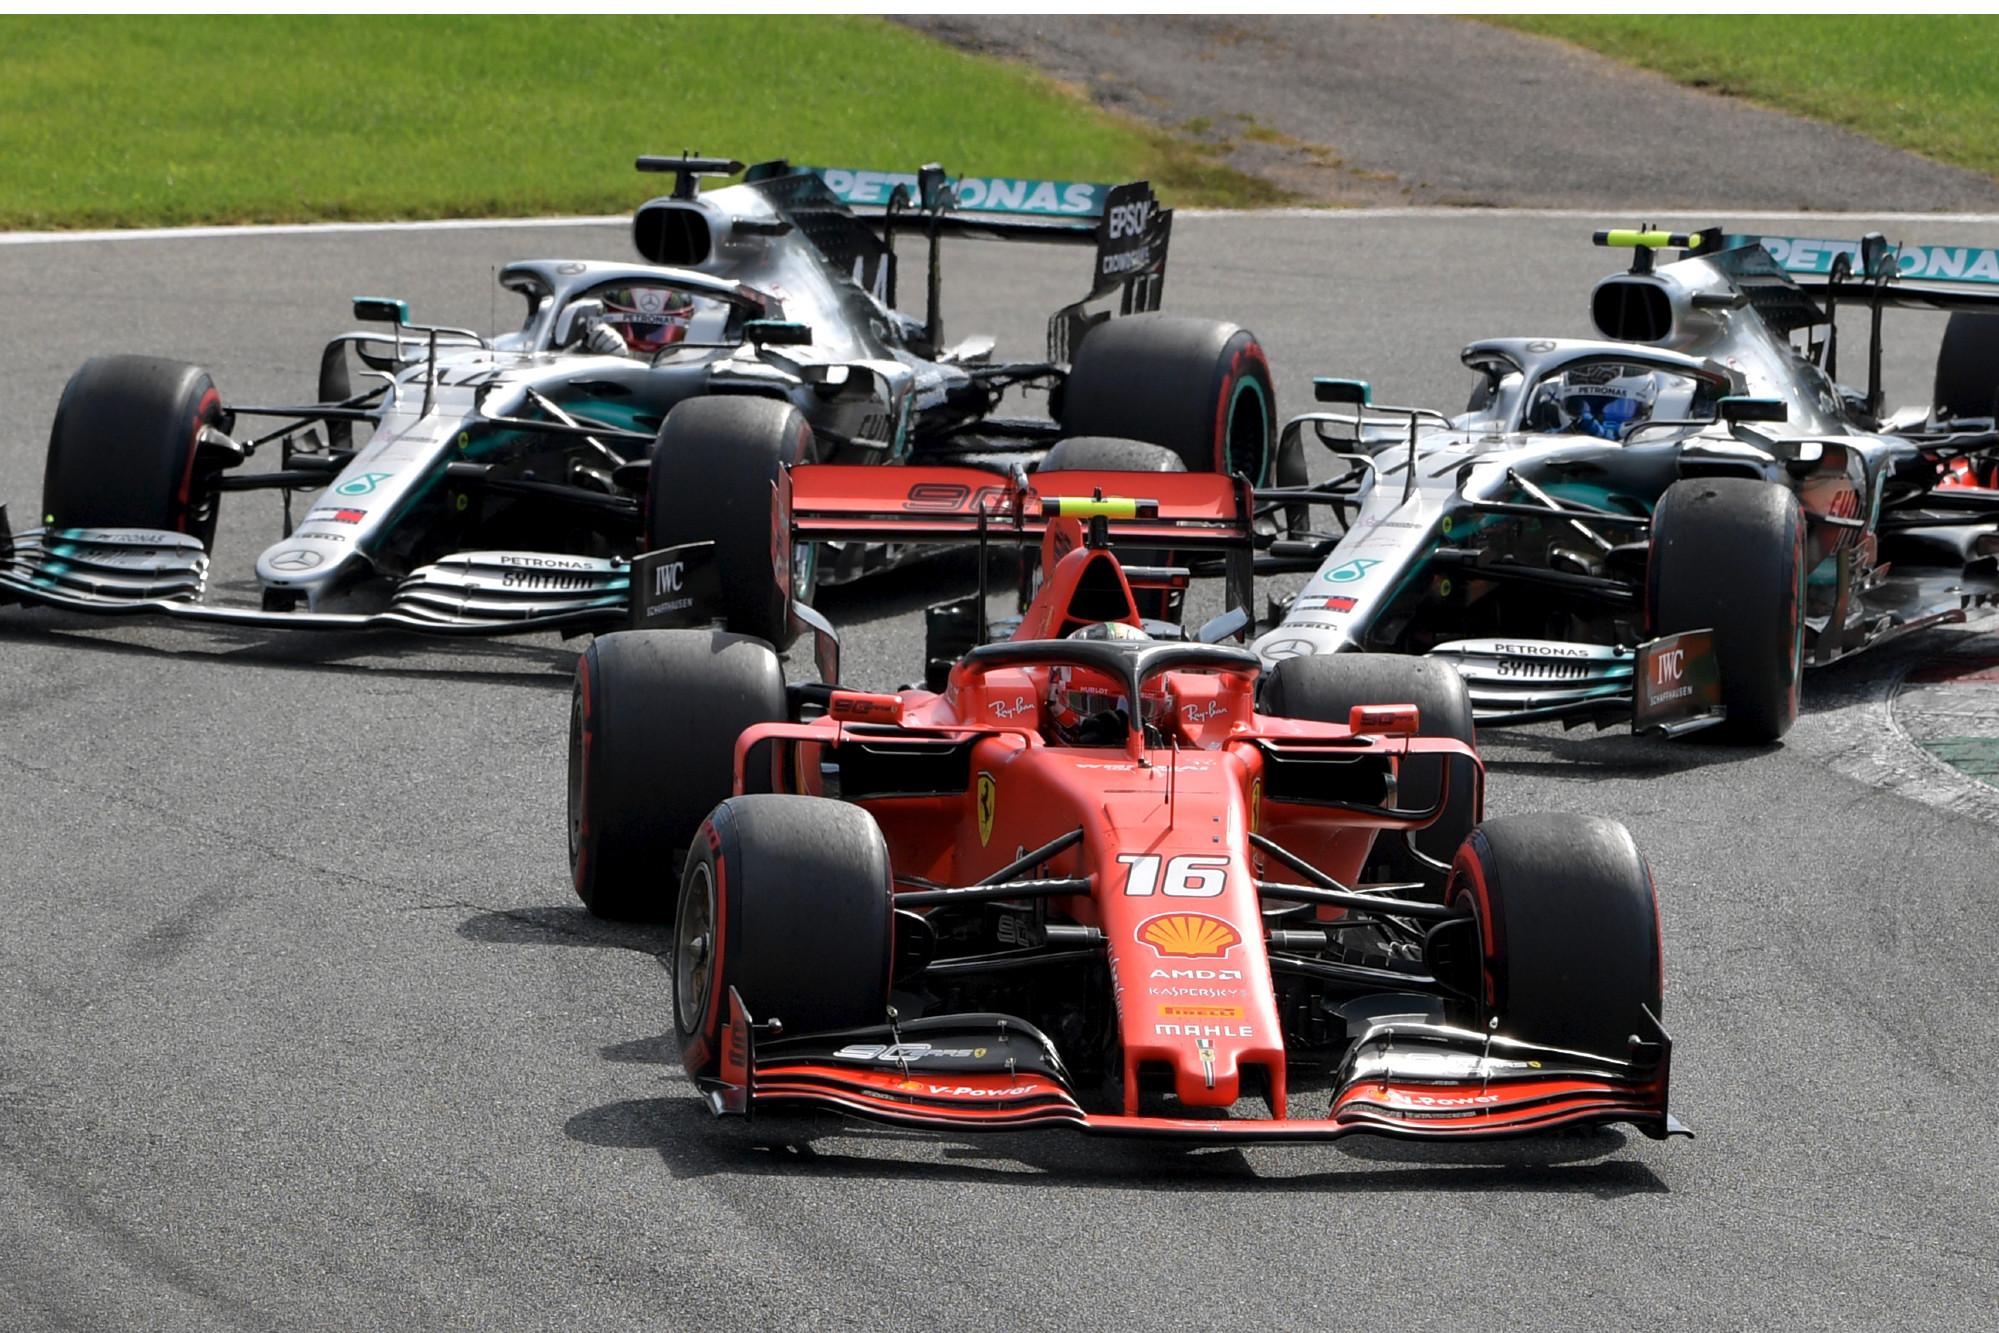 Charles Leclerc, 2019 Italian GP